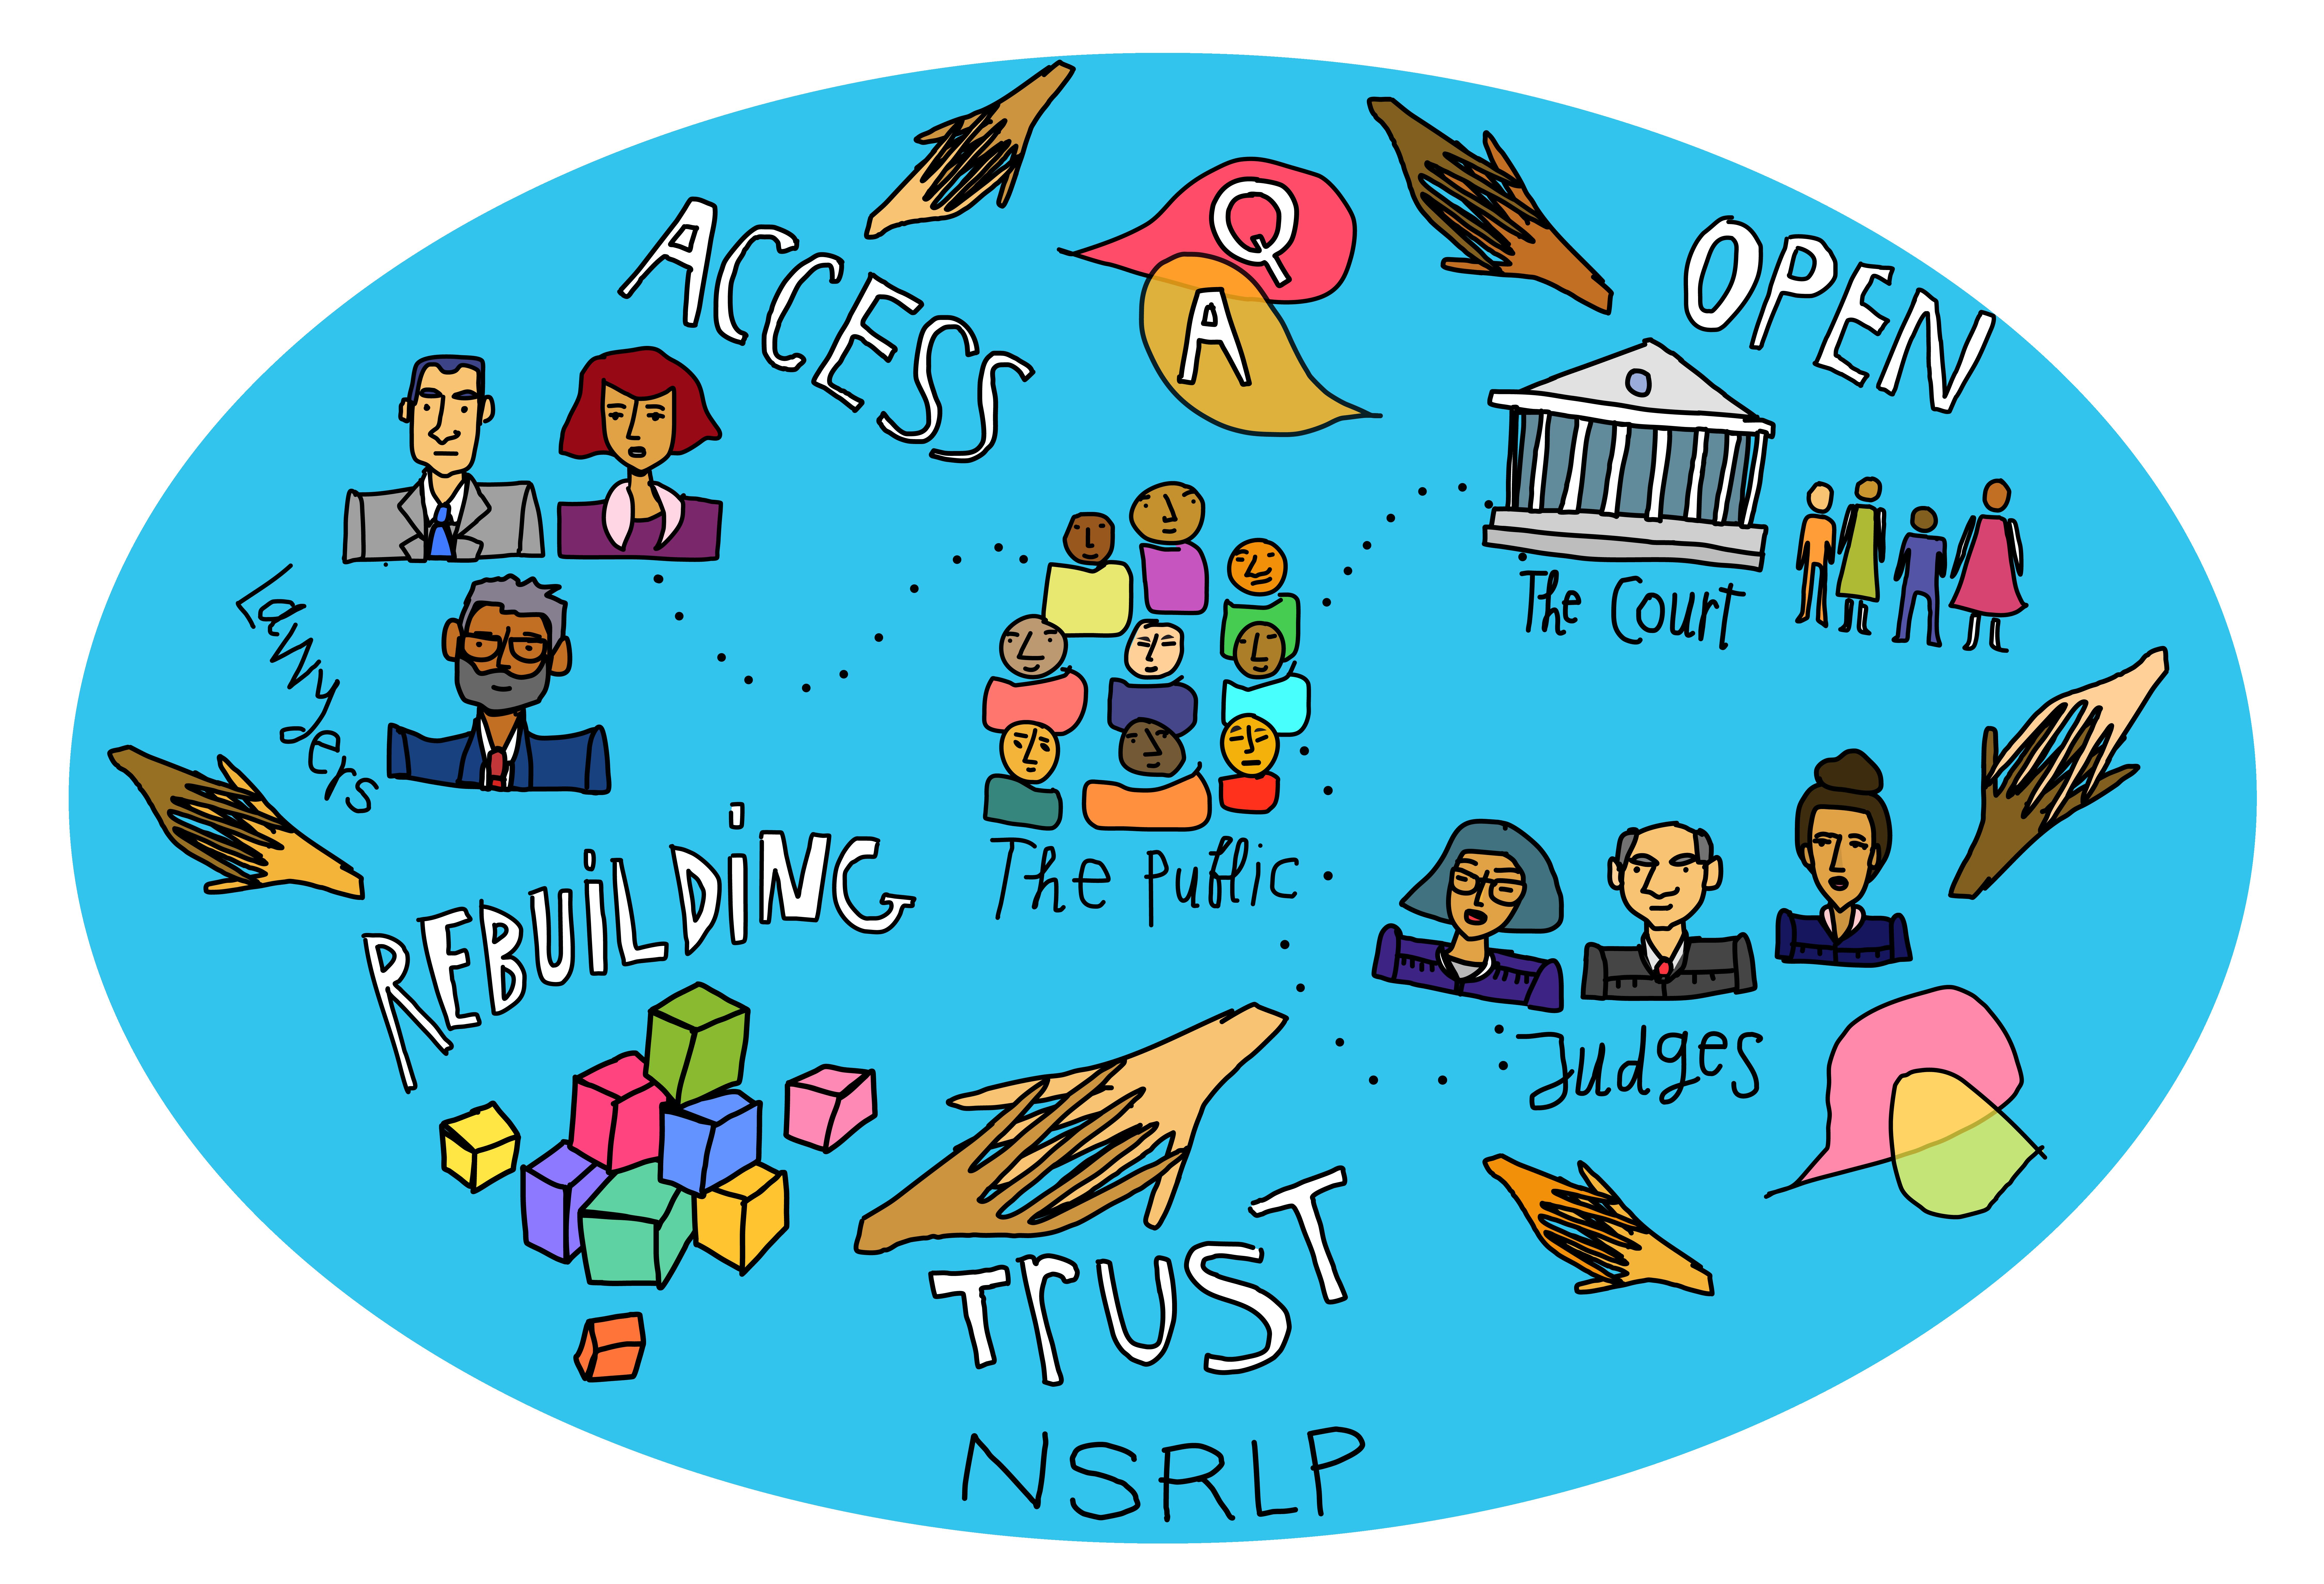 Rebuilding the Public Trust - v3-01-2